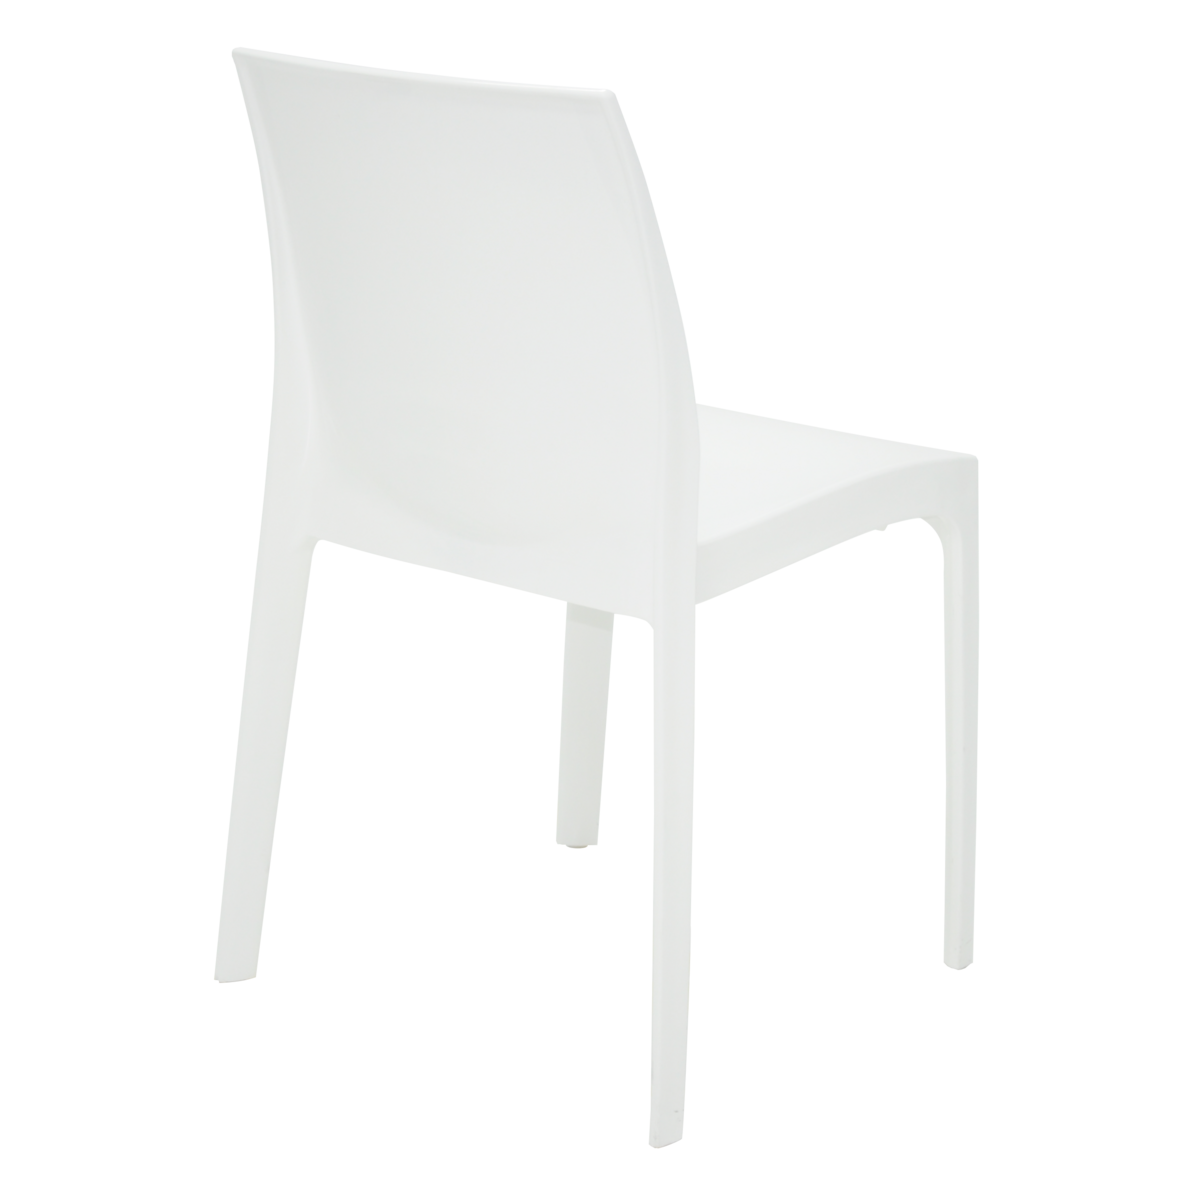 Cadeira Tramontina Alice Branco 92037/010 1 Peça  - Casa Mattos